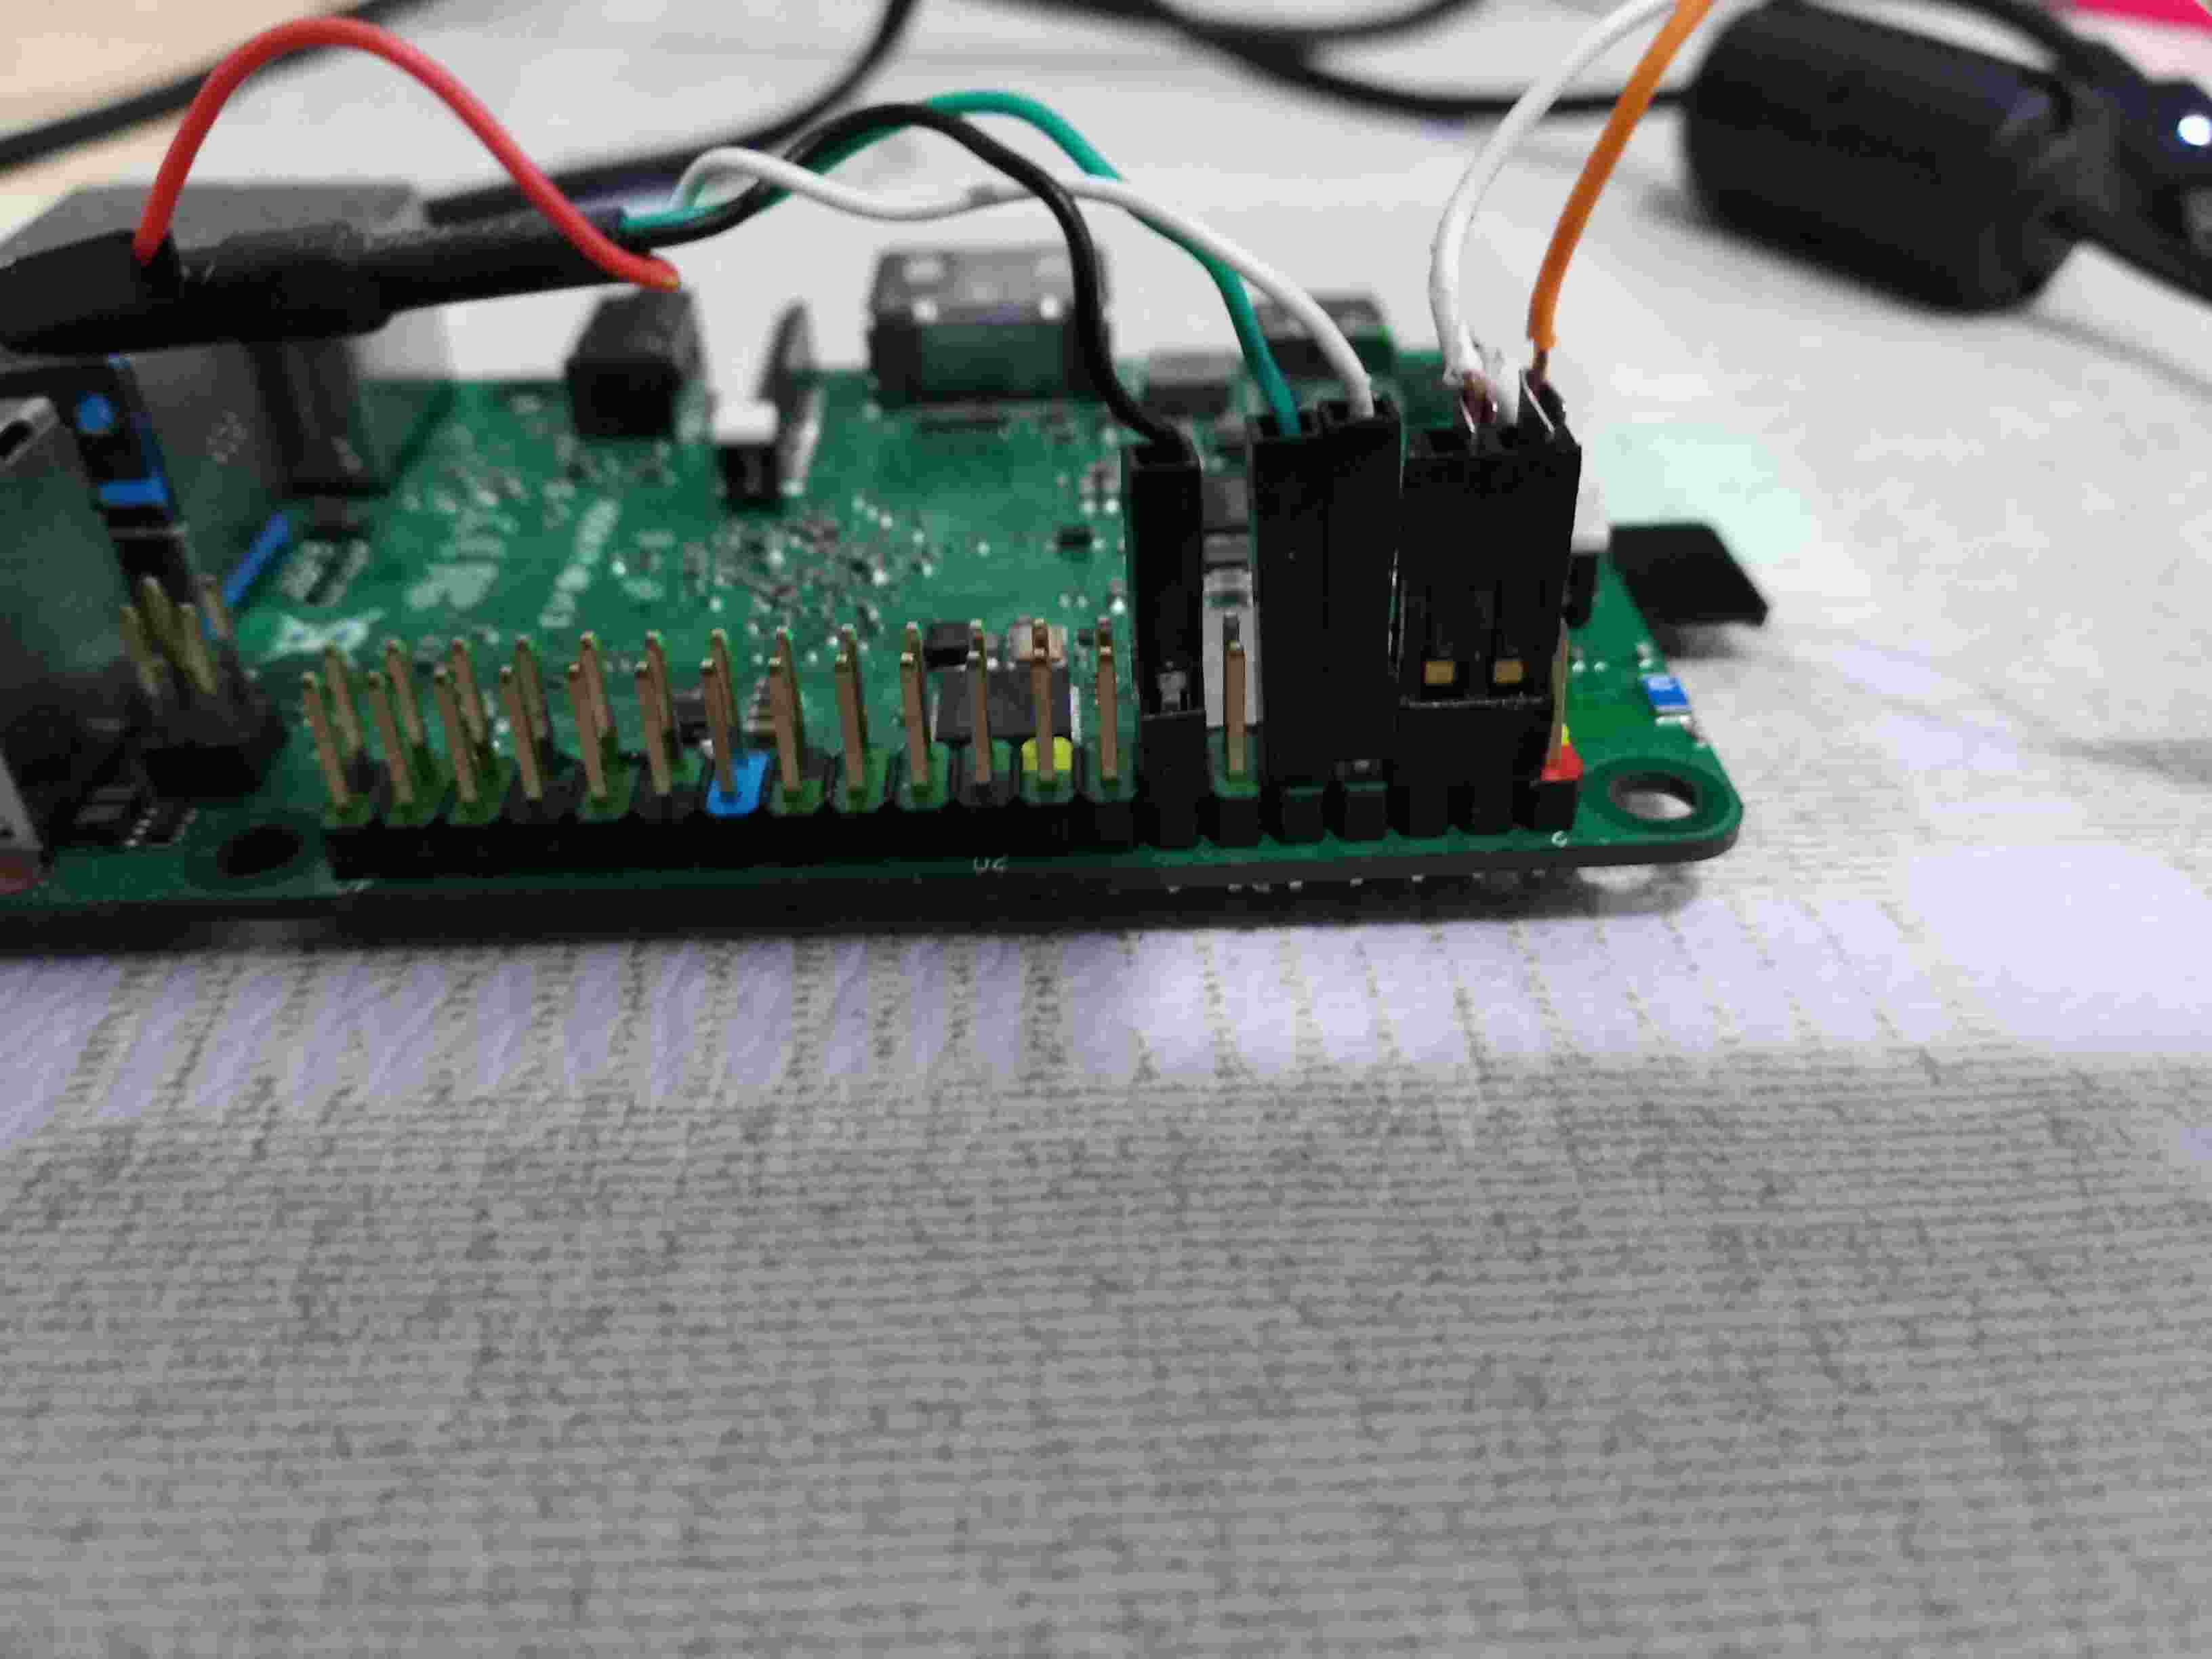 img/power_gpio_header_console.jpg